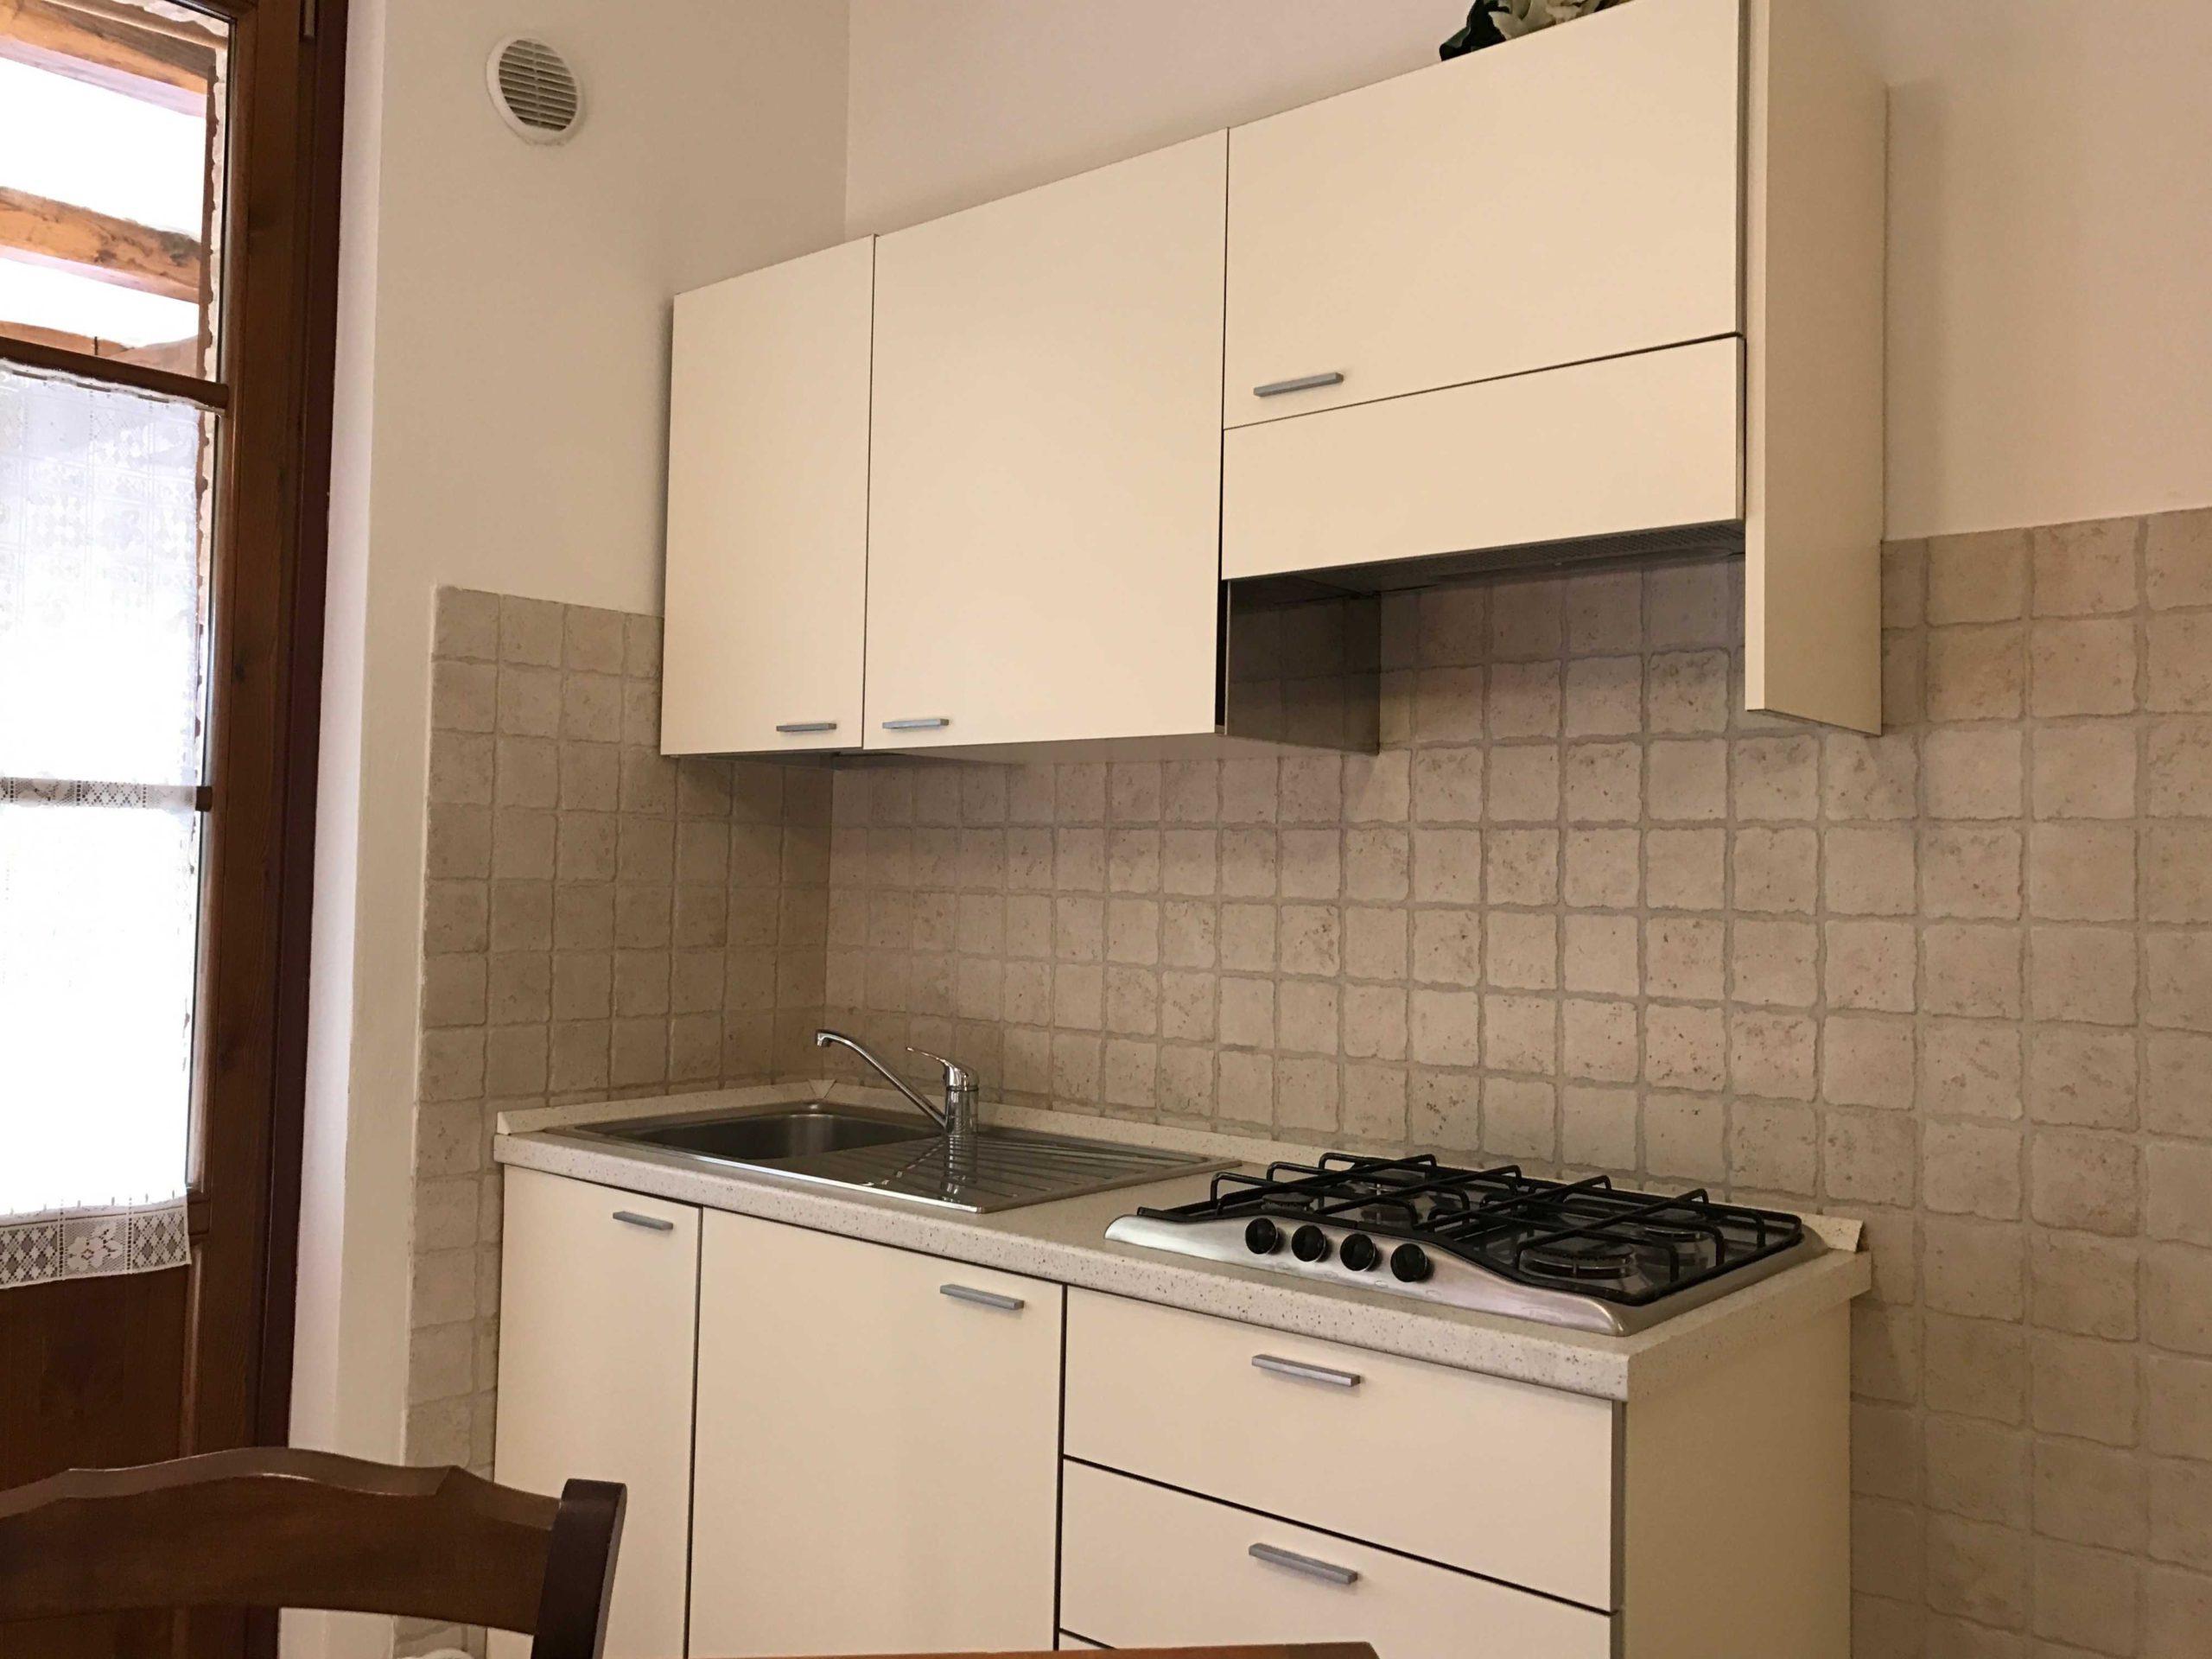 Aria kitchenette